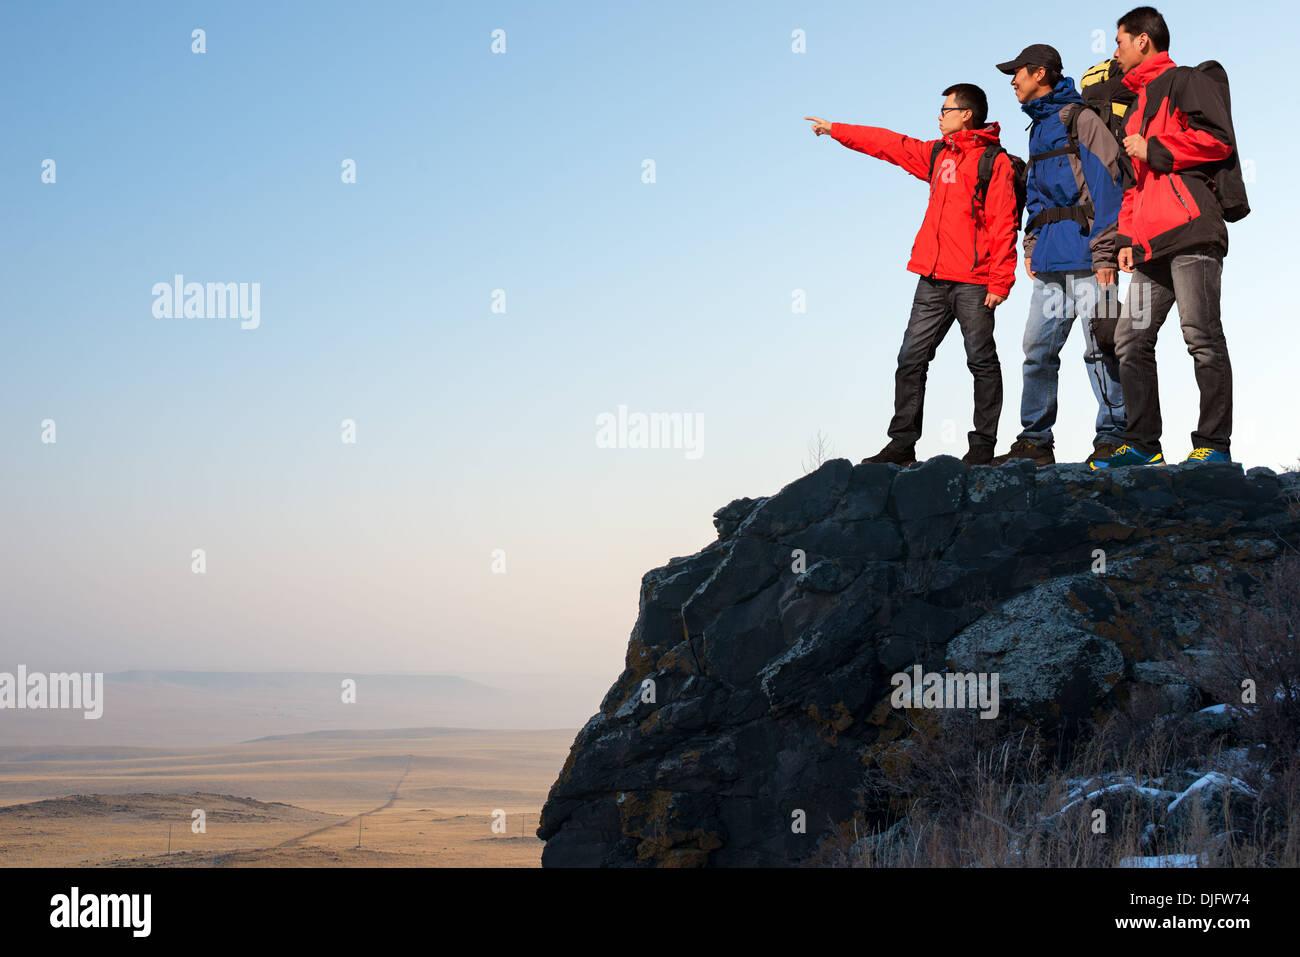 Trekking In Mountains Greet The Morning Sun Stock Photo 63043992